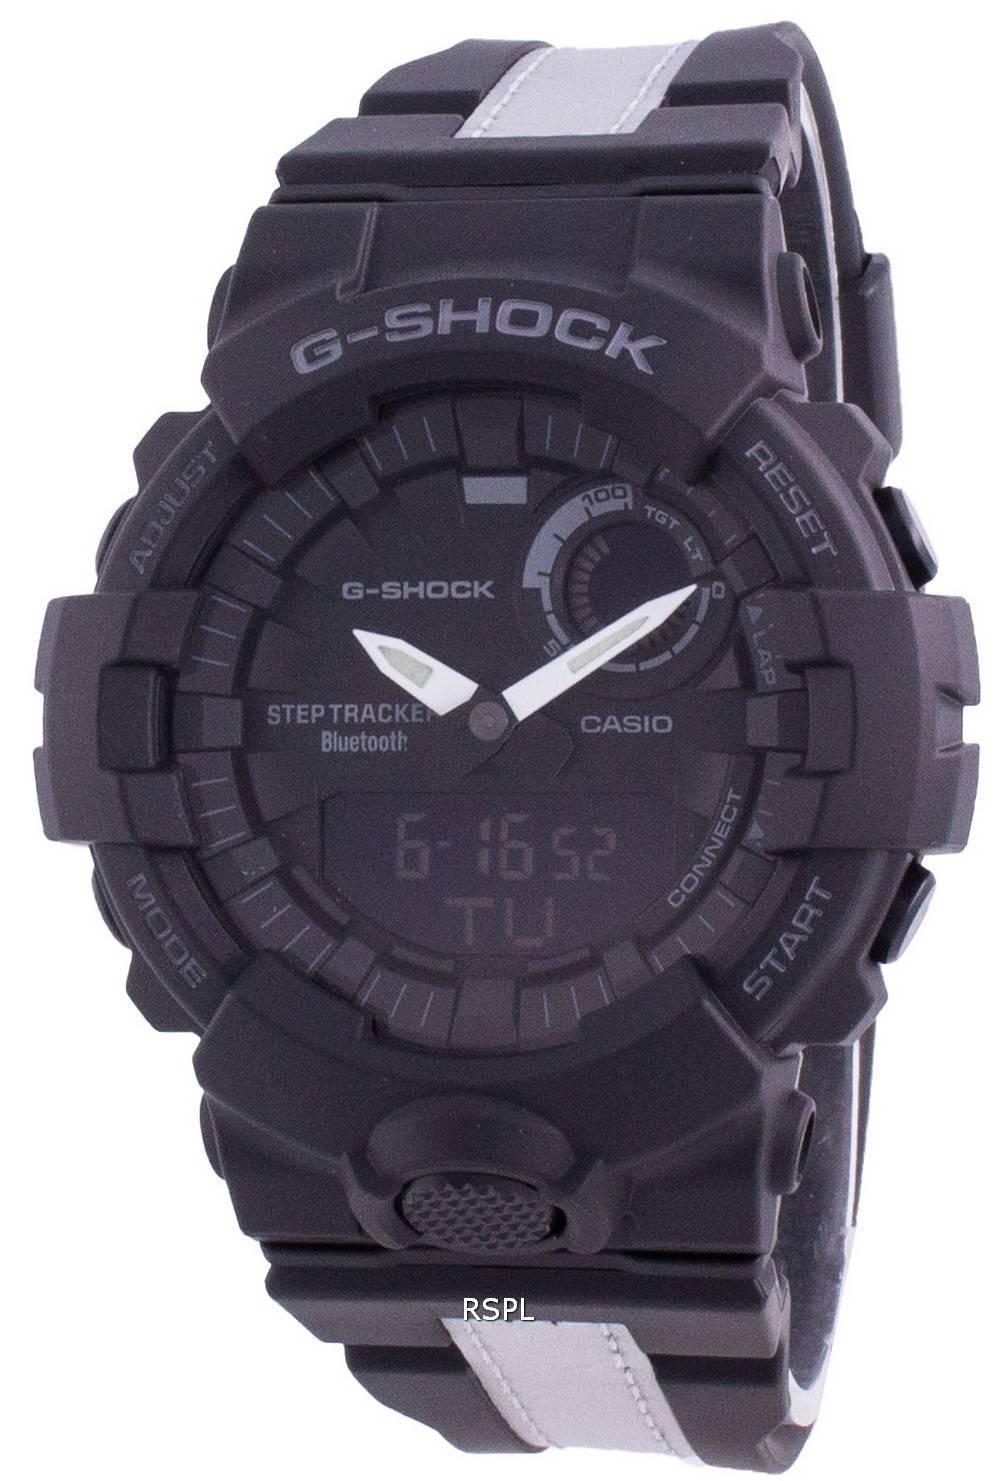 Casio G-Shock GBA-800LU-1A Quartz Shock Resistant 200M Men's Watch